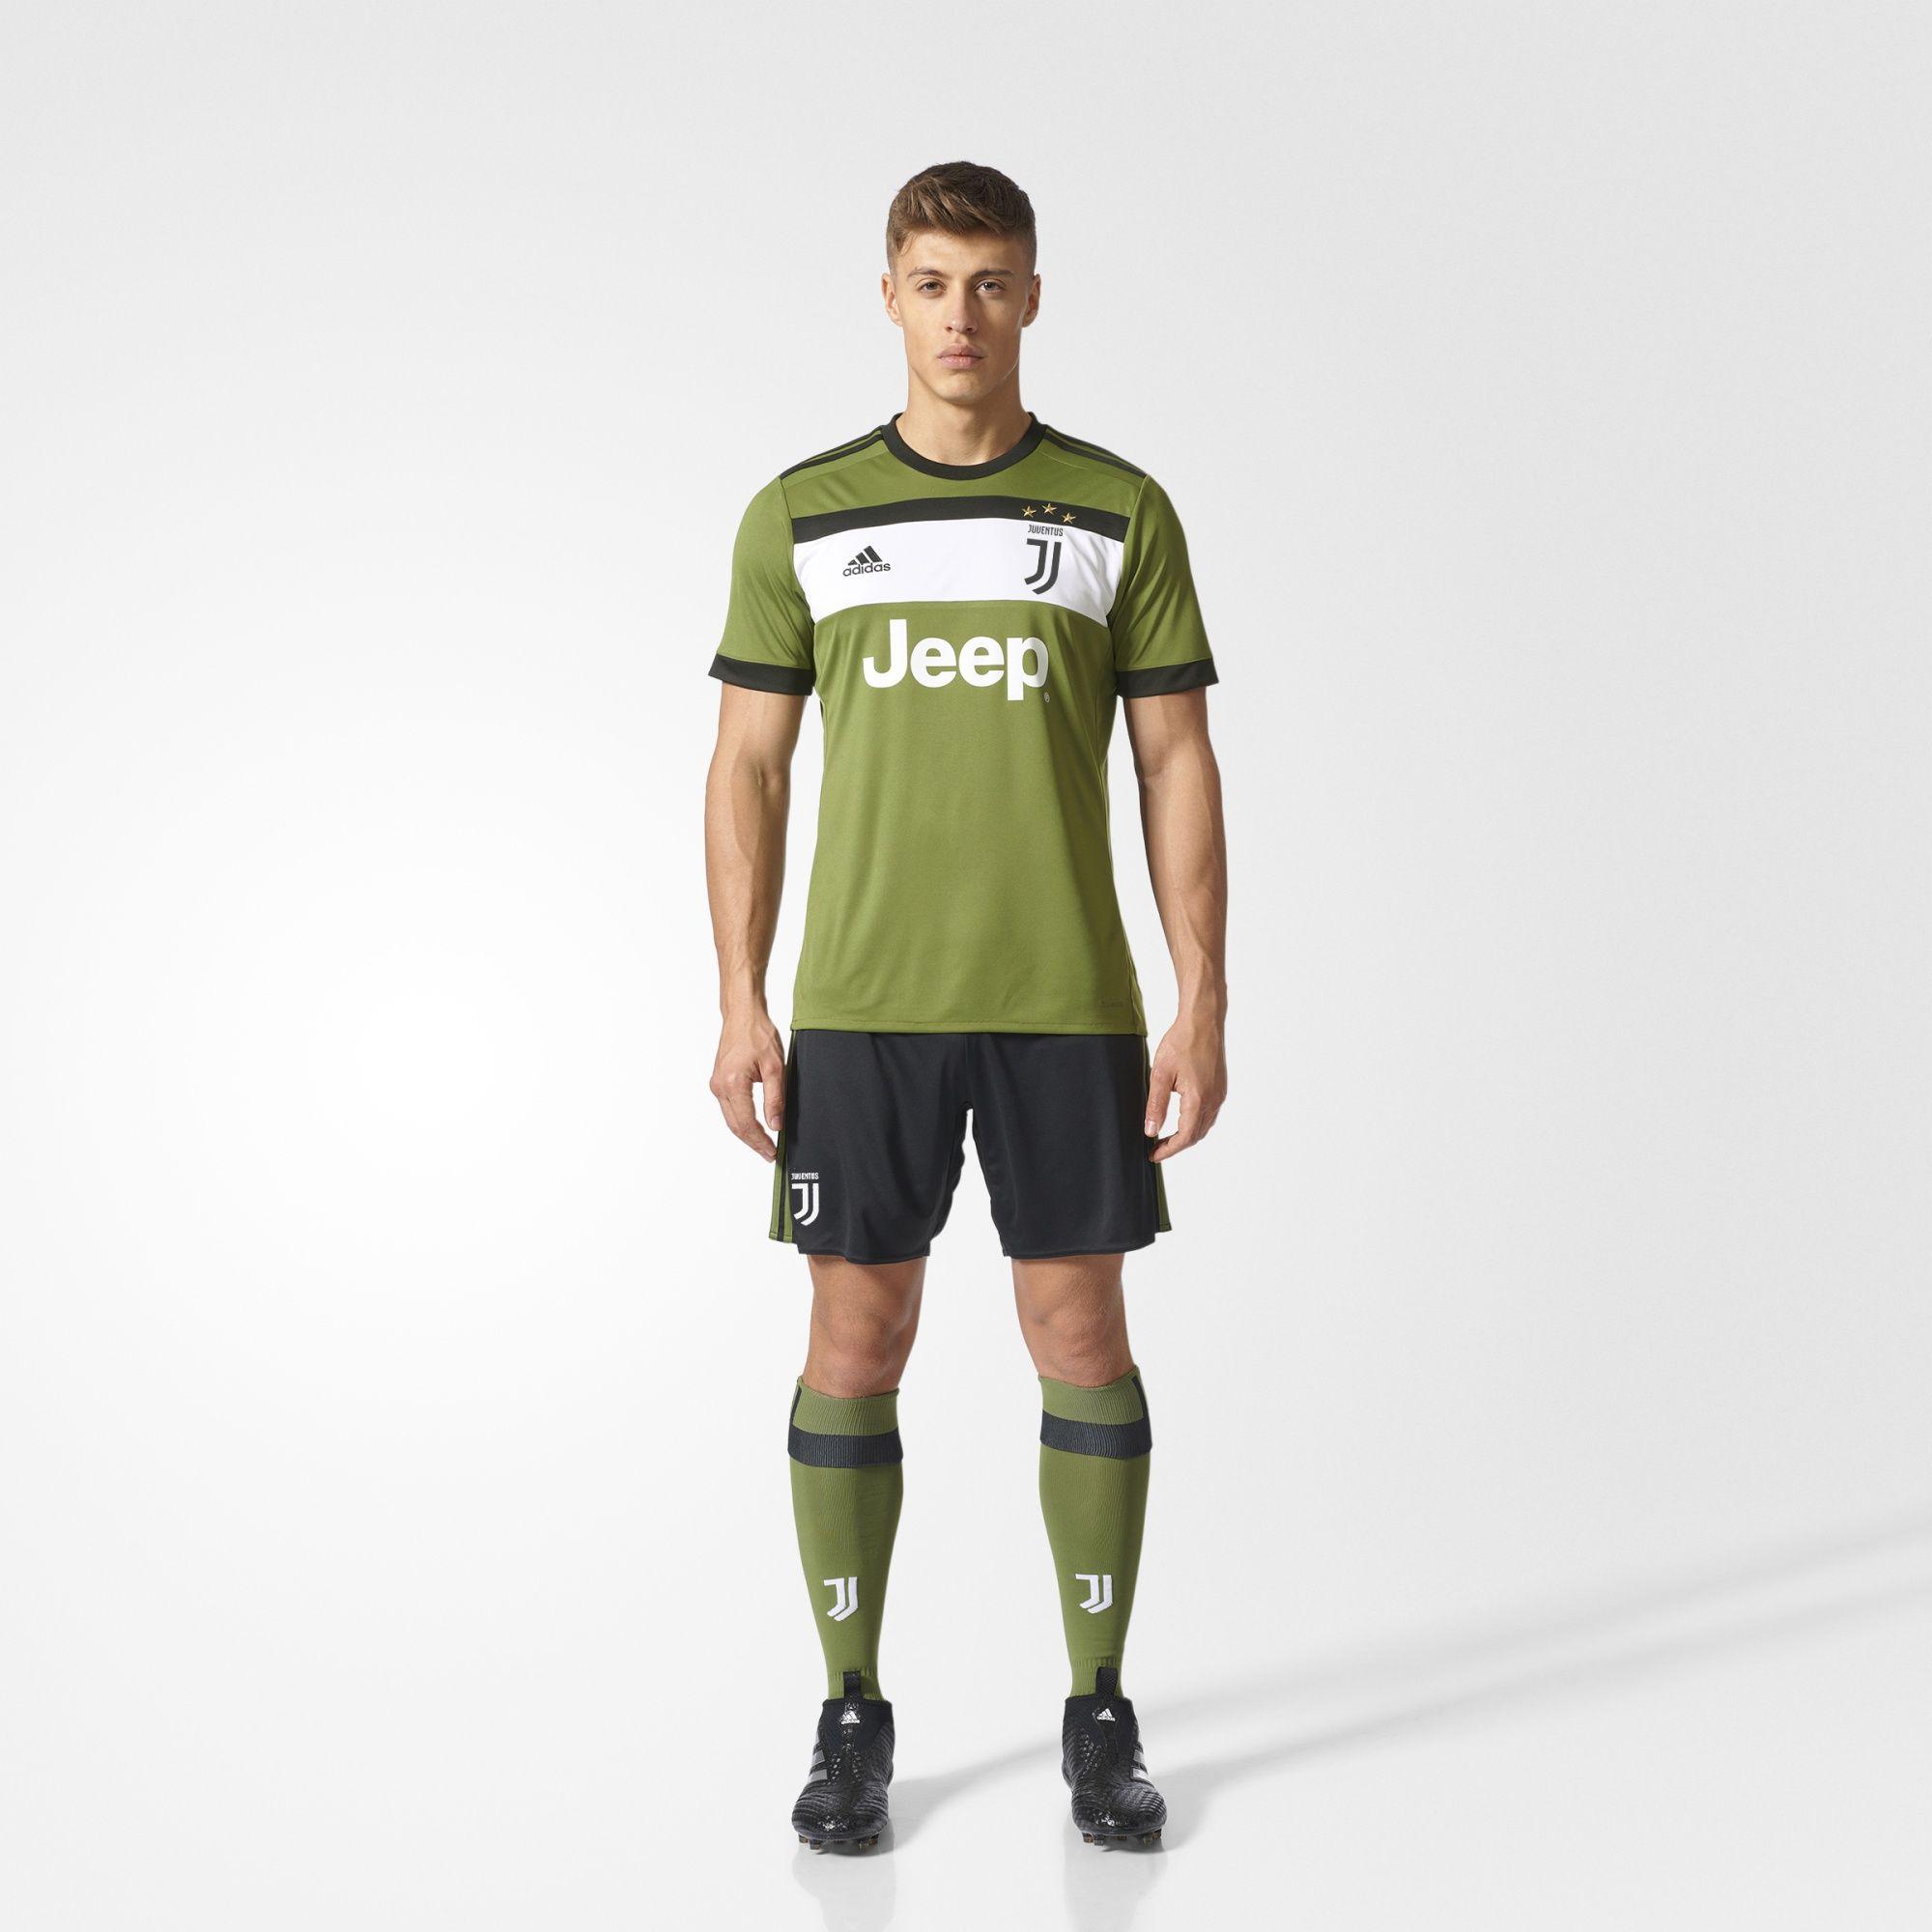 release date 6e17d 3a9b1 Juventus 17/18 Adidas Third Kit | 17/18 Kits | Football ...